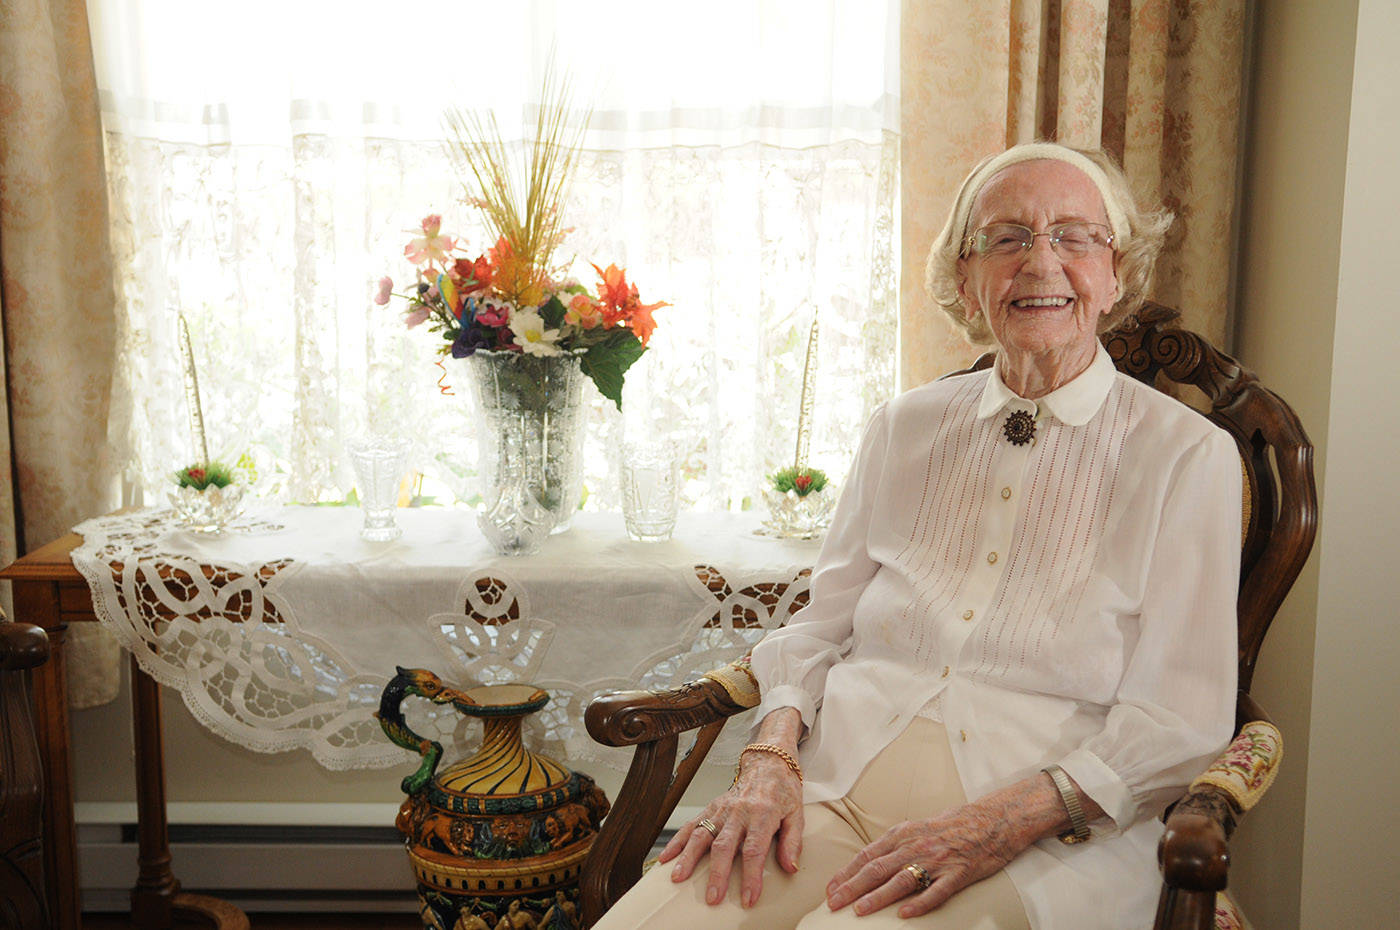 Hedy Sutulov, seen here on Aug. 12, 2021, turned 107 on Aug. 18, 2021. (Jenna Hauck/ Chilliwack Progress)